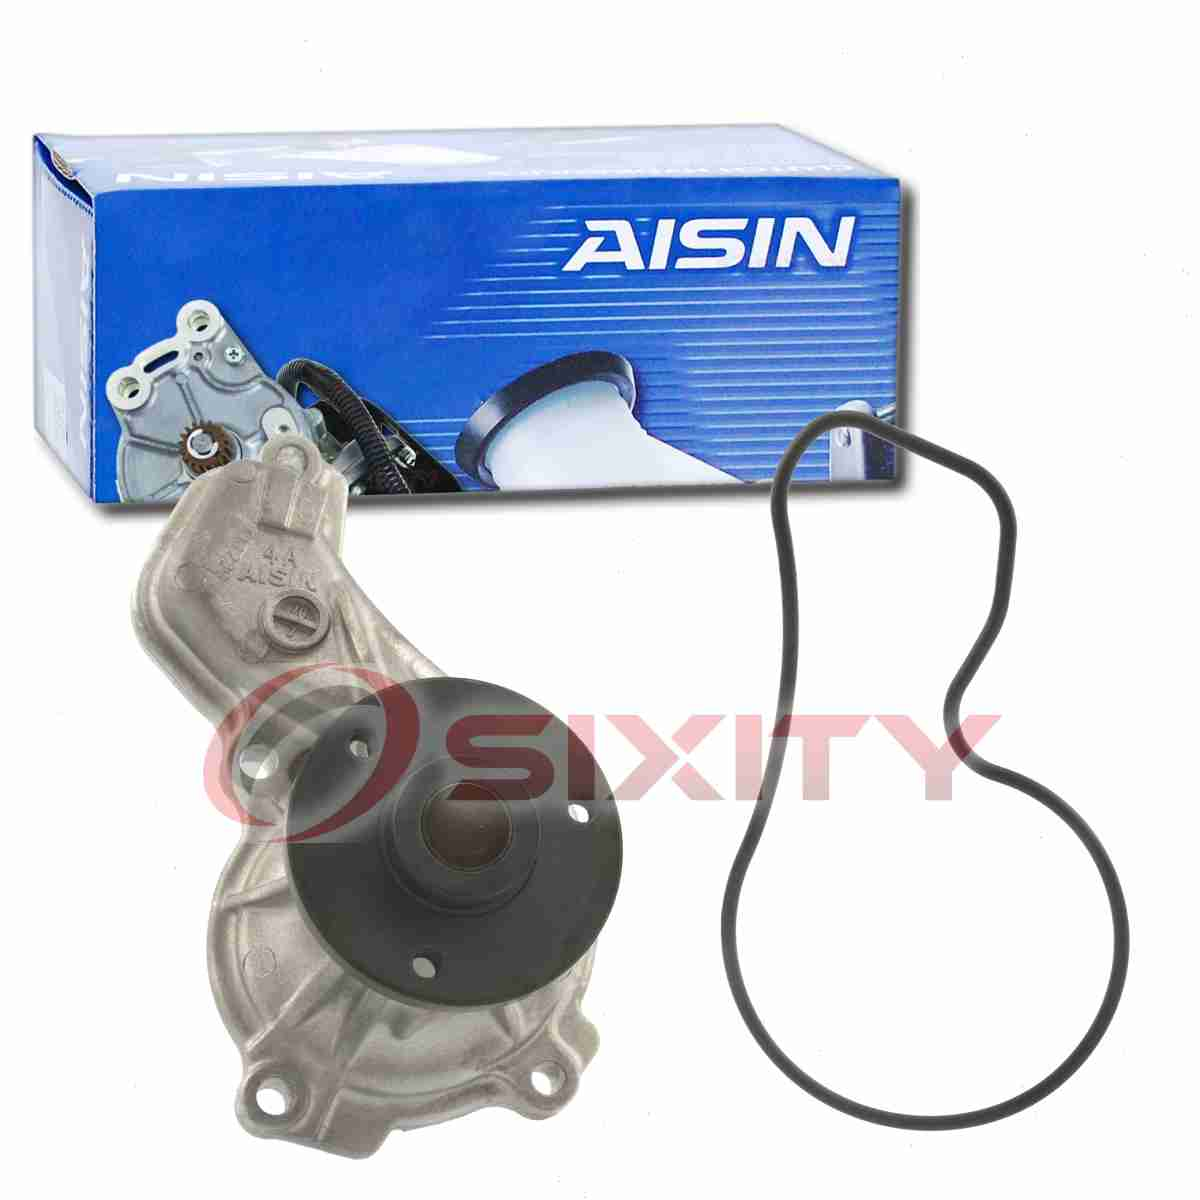 AISIN Engine Water Pump for 2006-2011 Honda Civic 1.8L L4 Coolant Antifreeze ep